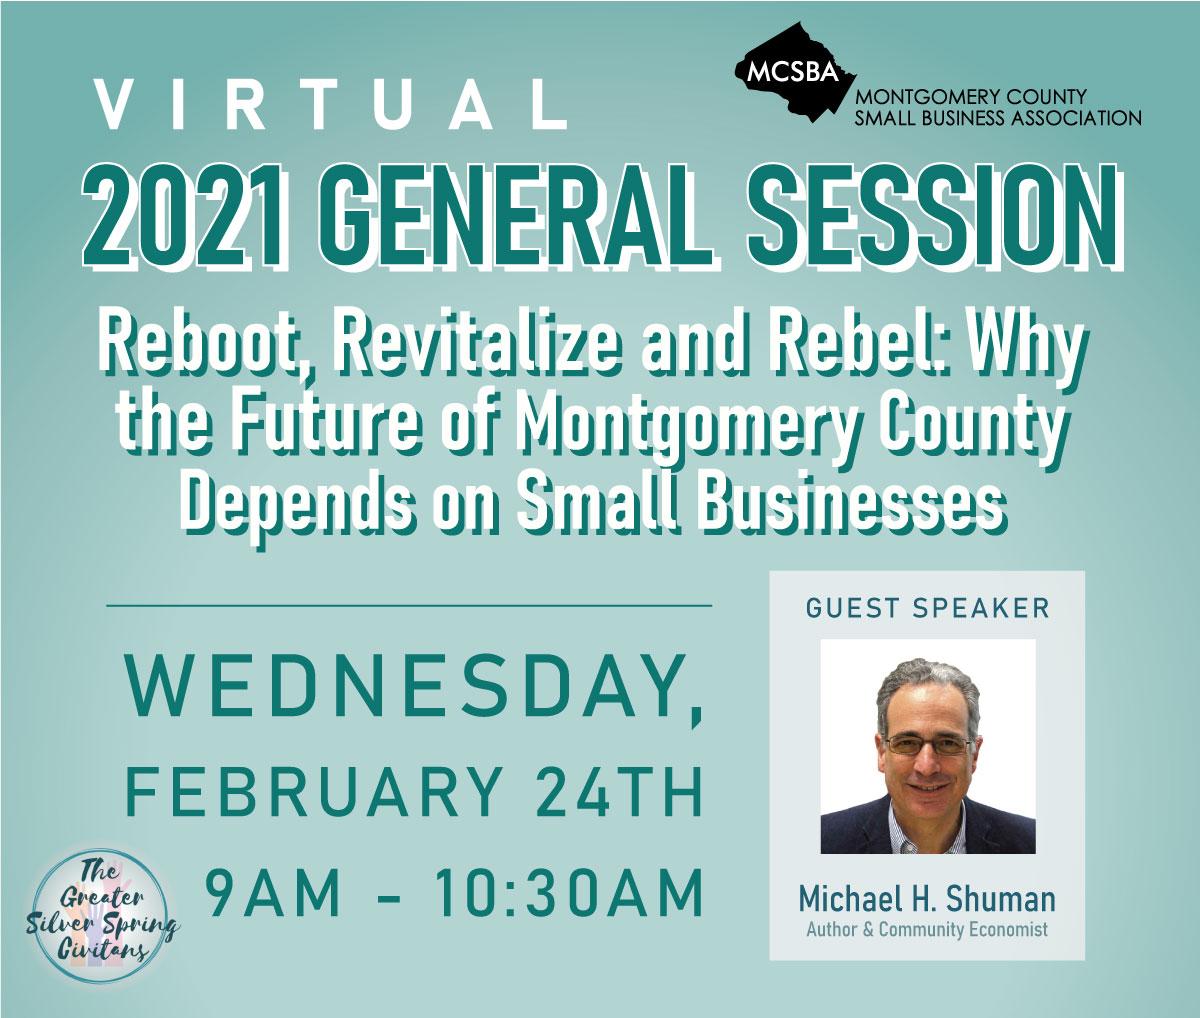 Reboot, Revitalize and Rebel, 02/24/2021